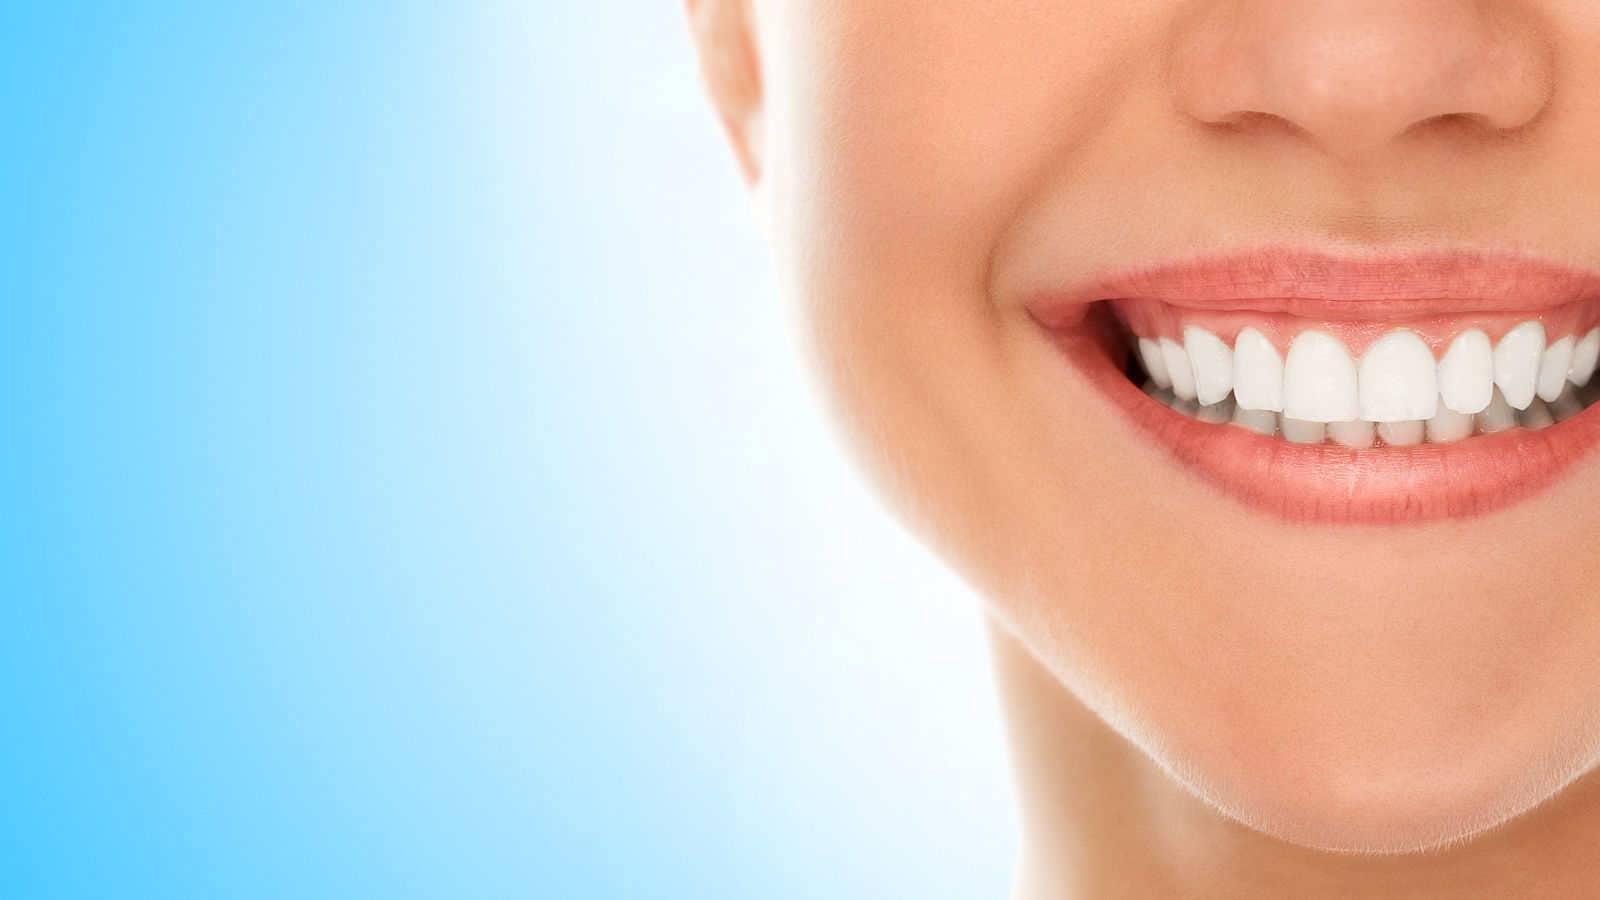 Robbinsdale DentalCare